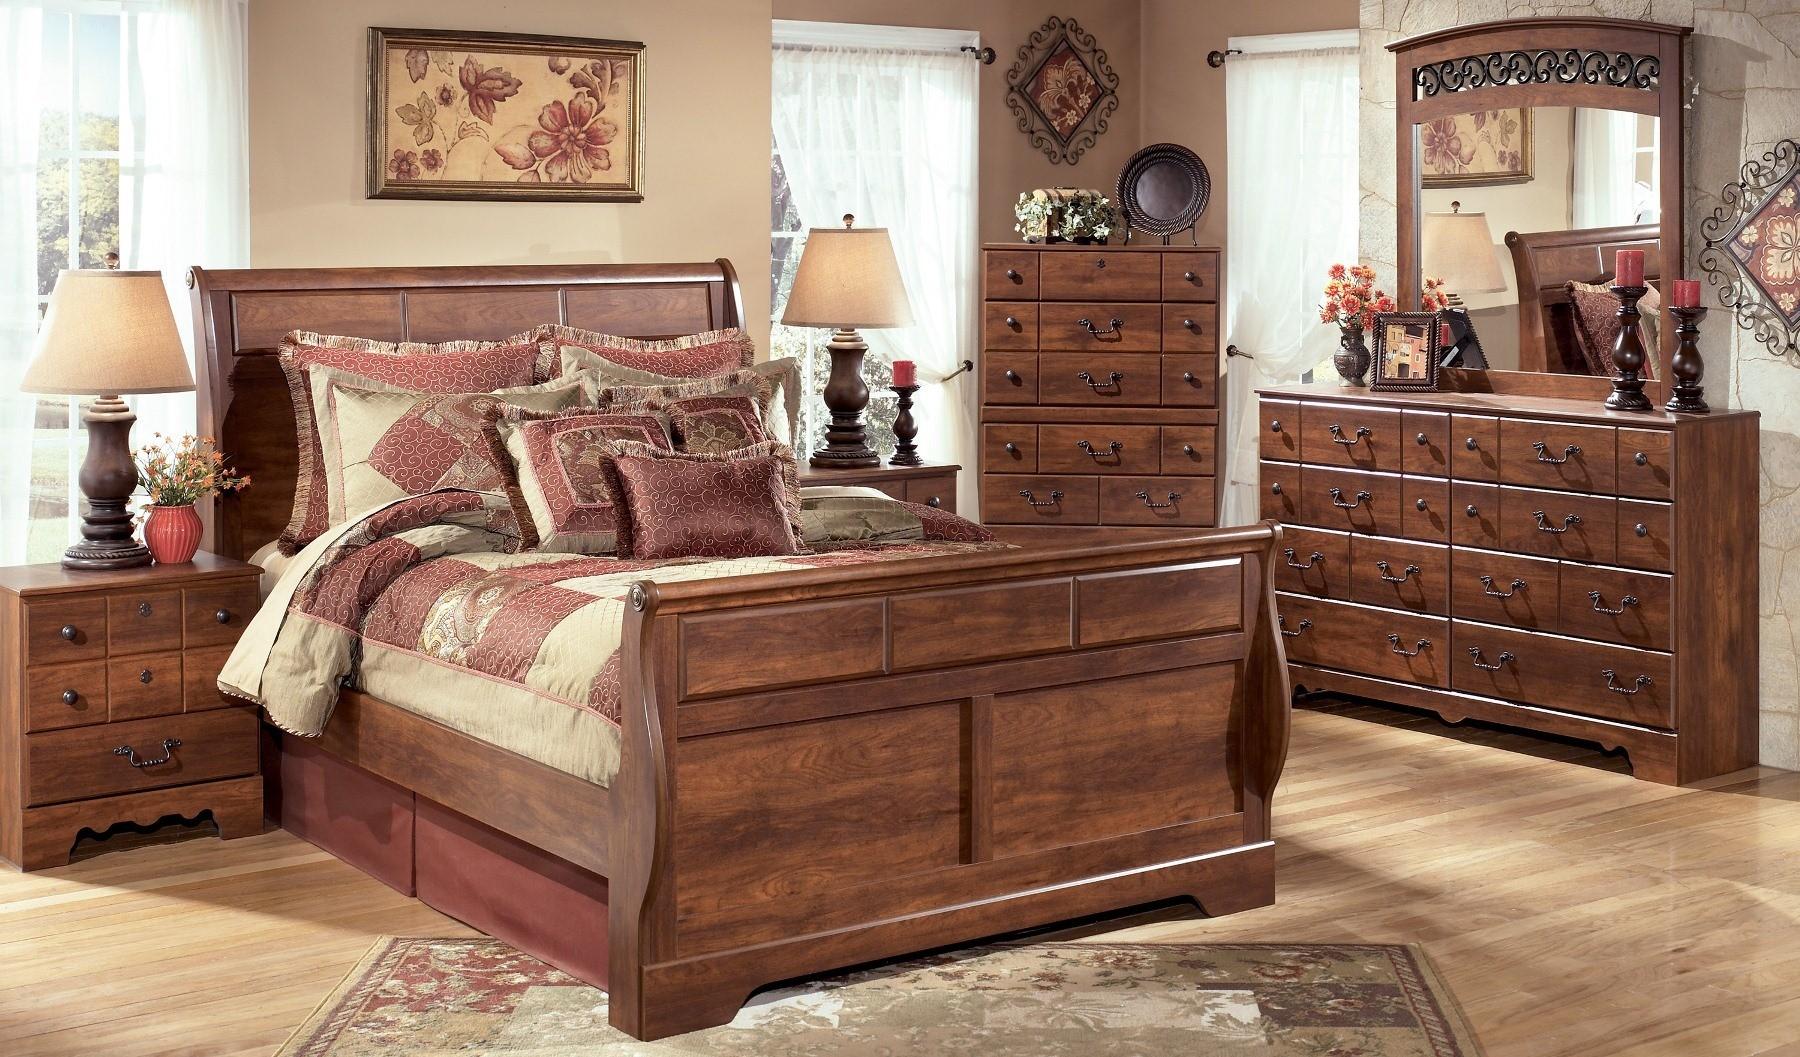 Timberline sleigh bedroom set from ashley b258 sl - Ashley furniture sleigh bedroom set ...